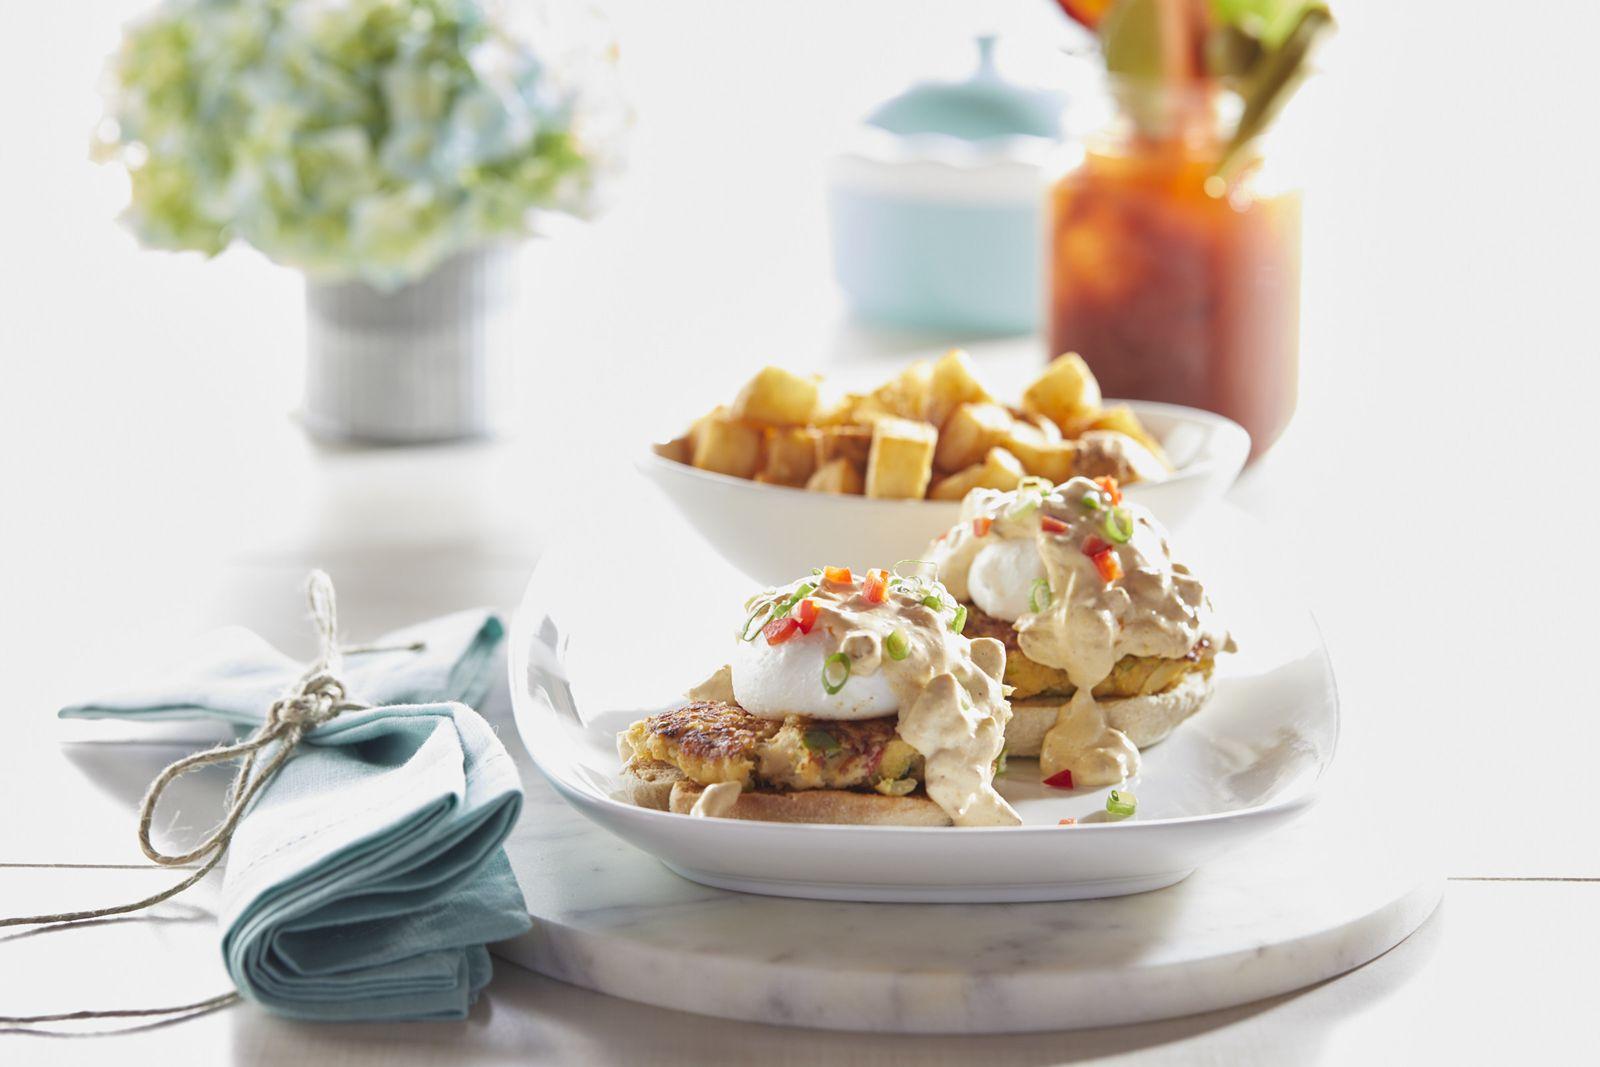 Another Broken Egg Cafe Crab Cake Benedict